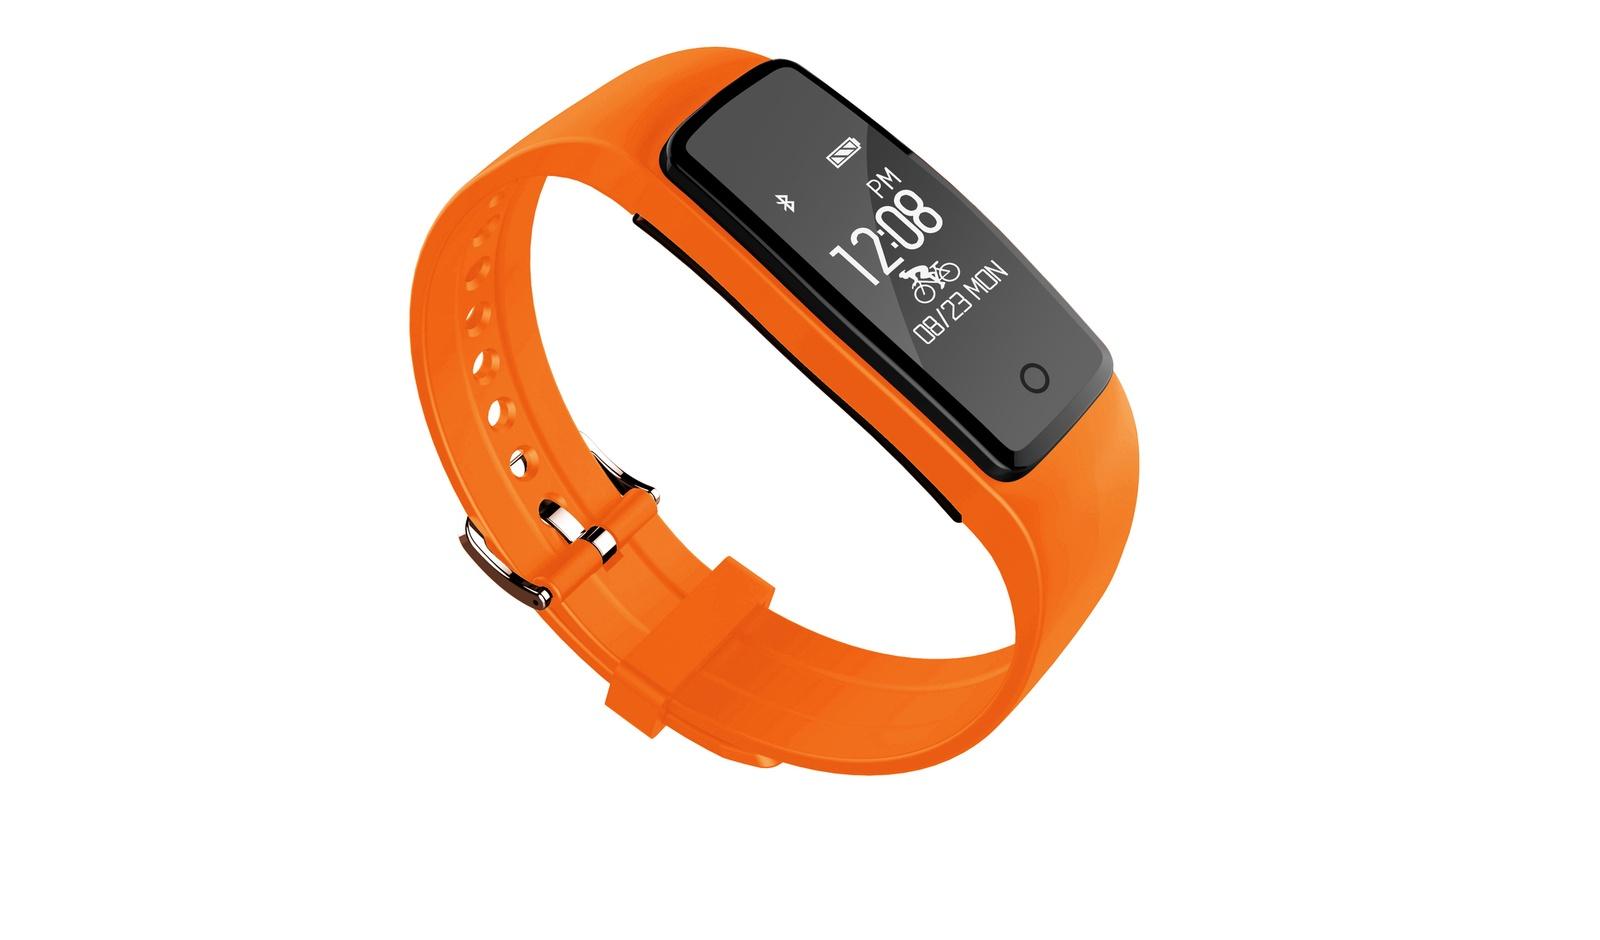 Умные часы XRide S1-2 фитнес браслет xride s1 с мониторингом сердечного ритма orange